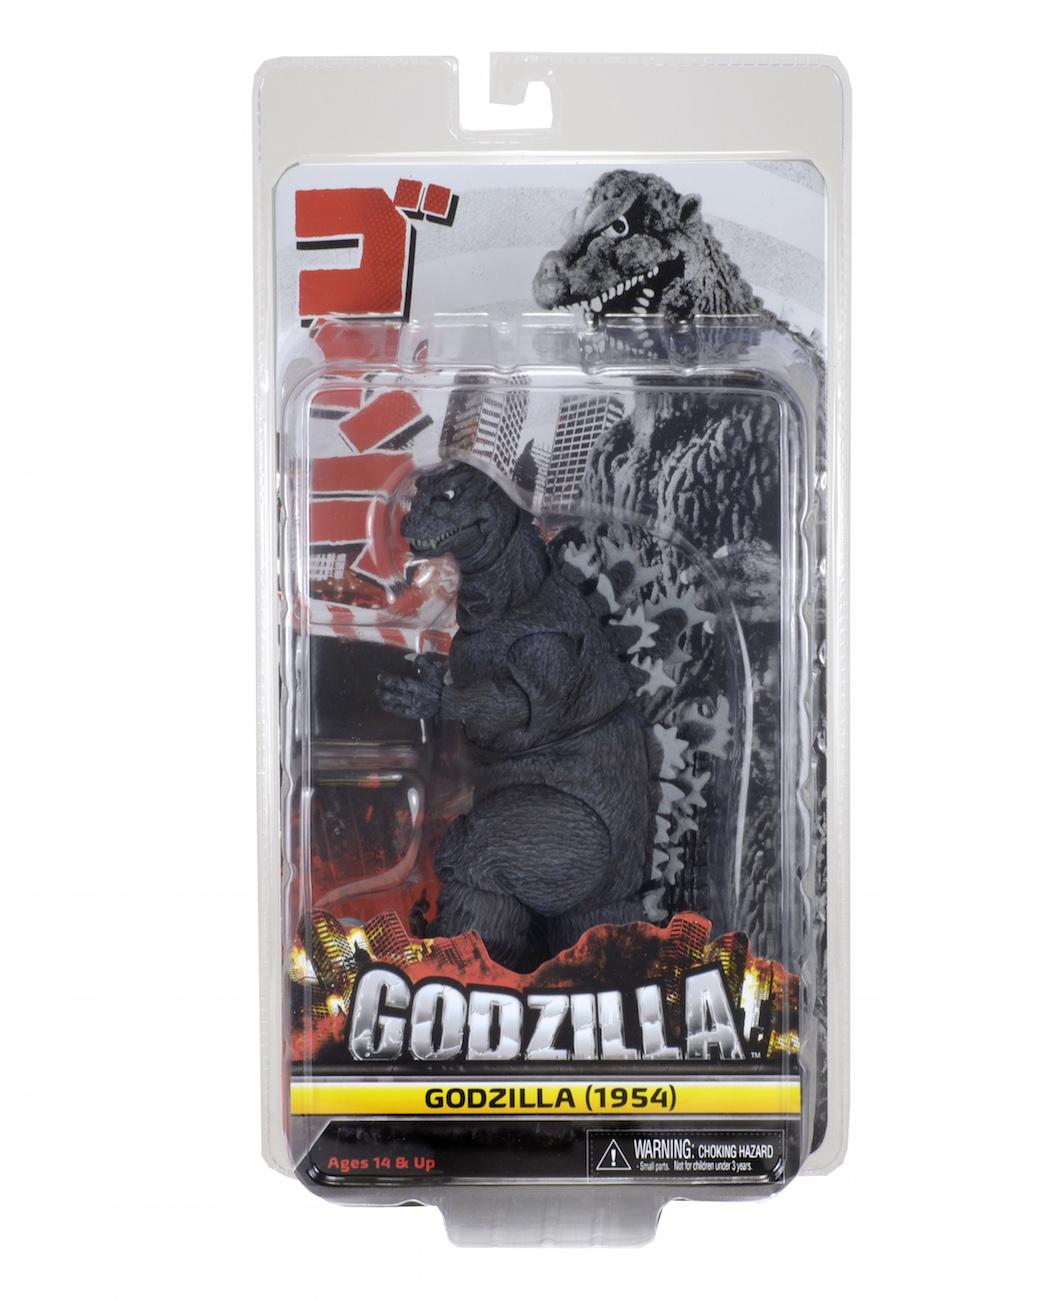 NECA Godzilla 1954 – 12″ Head-To-Tail Action Figure Listed On Ebay